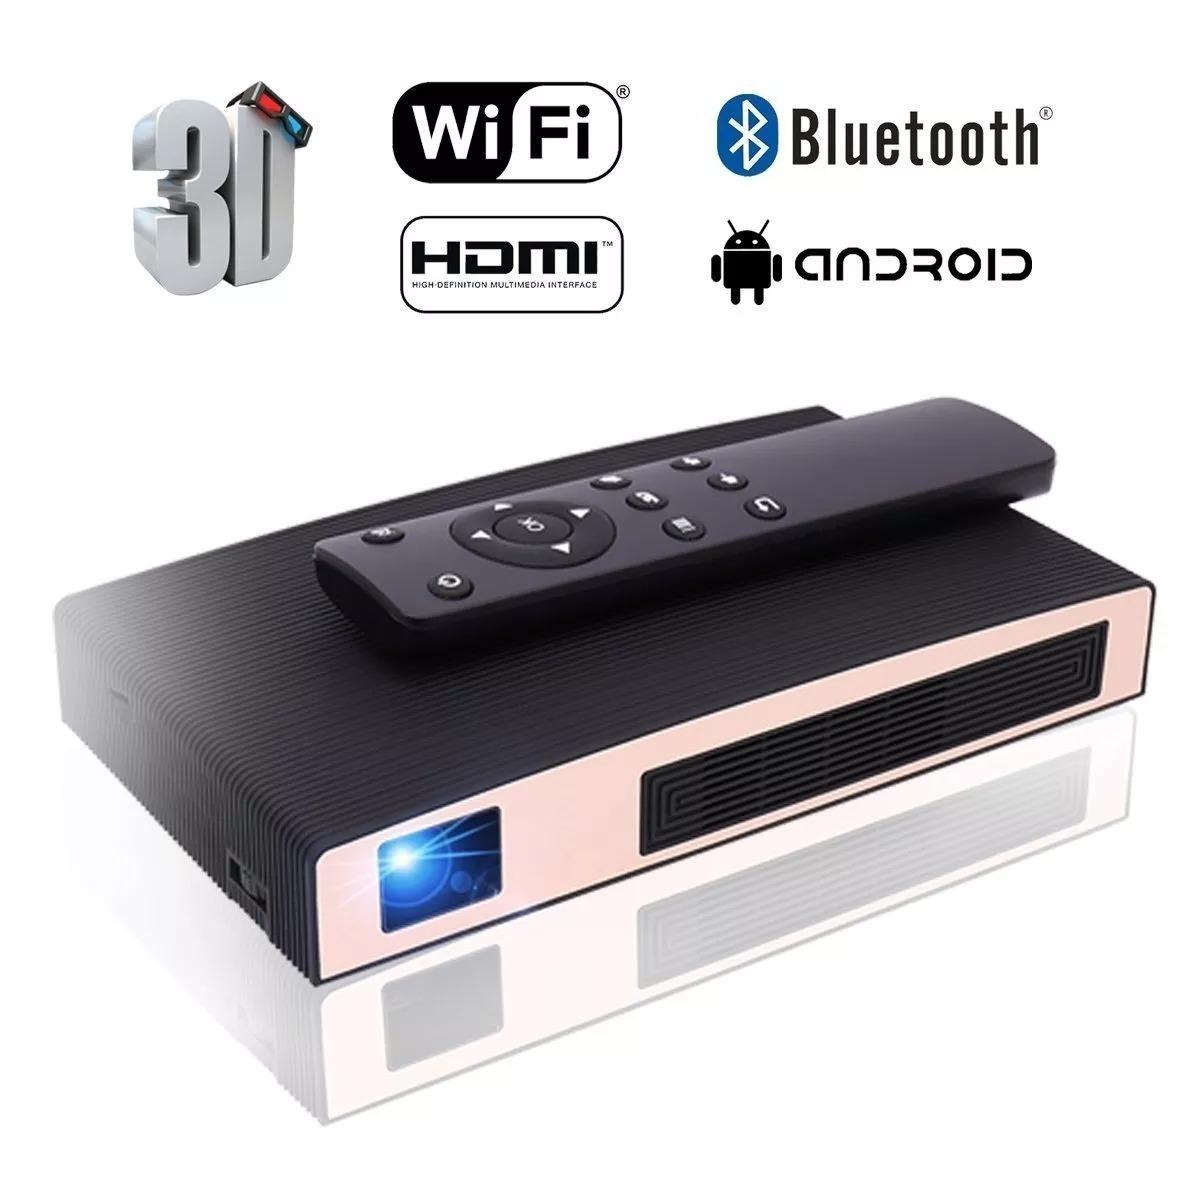 Mini Projector, Motou Dlp Portable Video Led 1080p